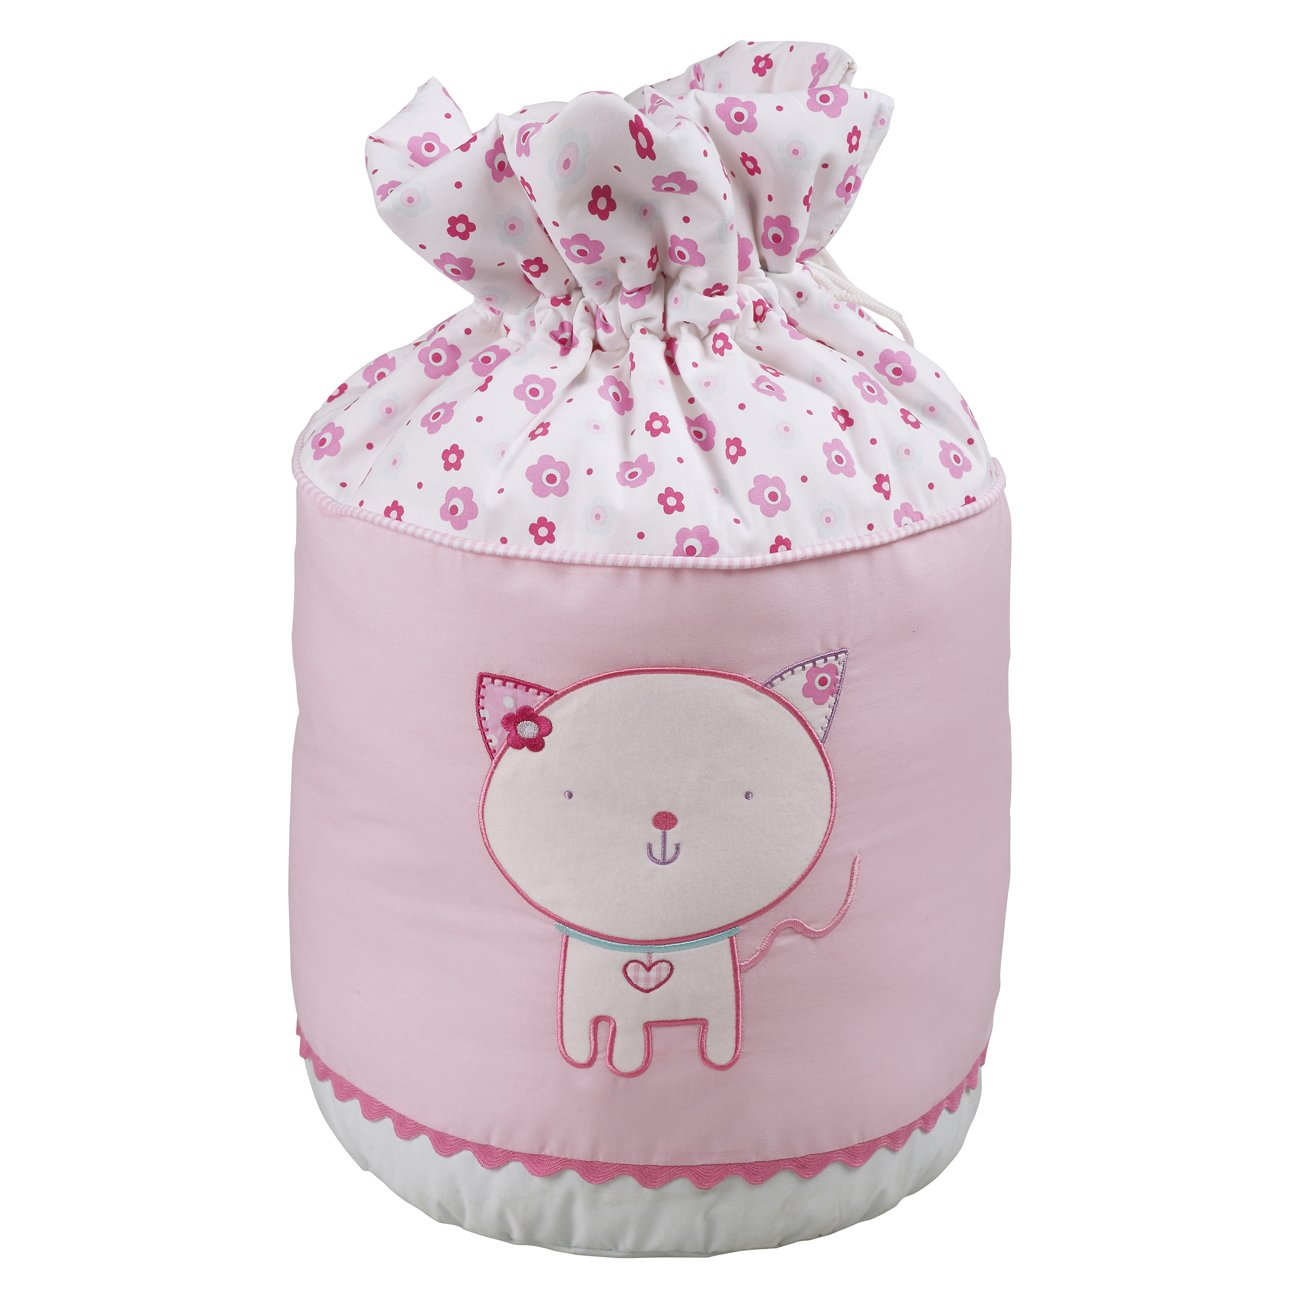 Bed-e-Byes Purfect - Bolsa para ropa sucia, color rosa 280/177/36